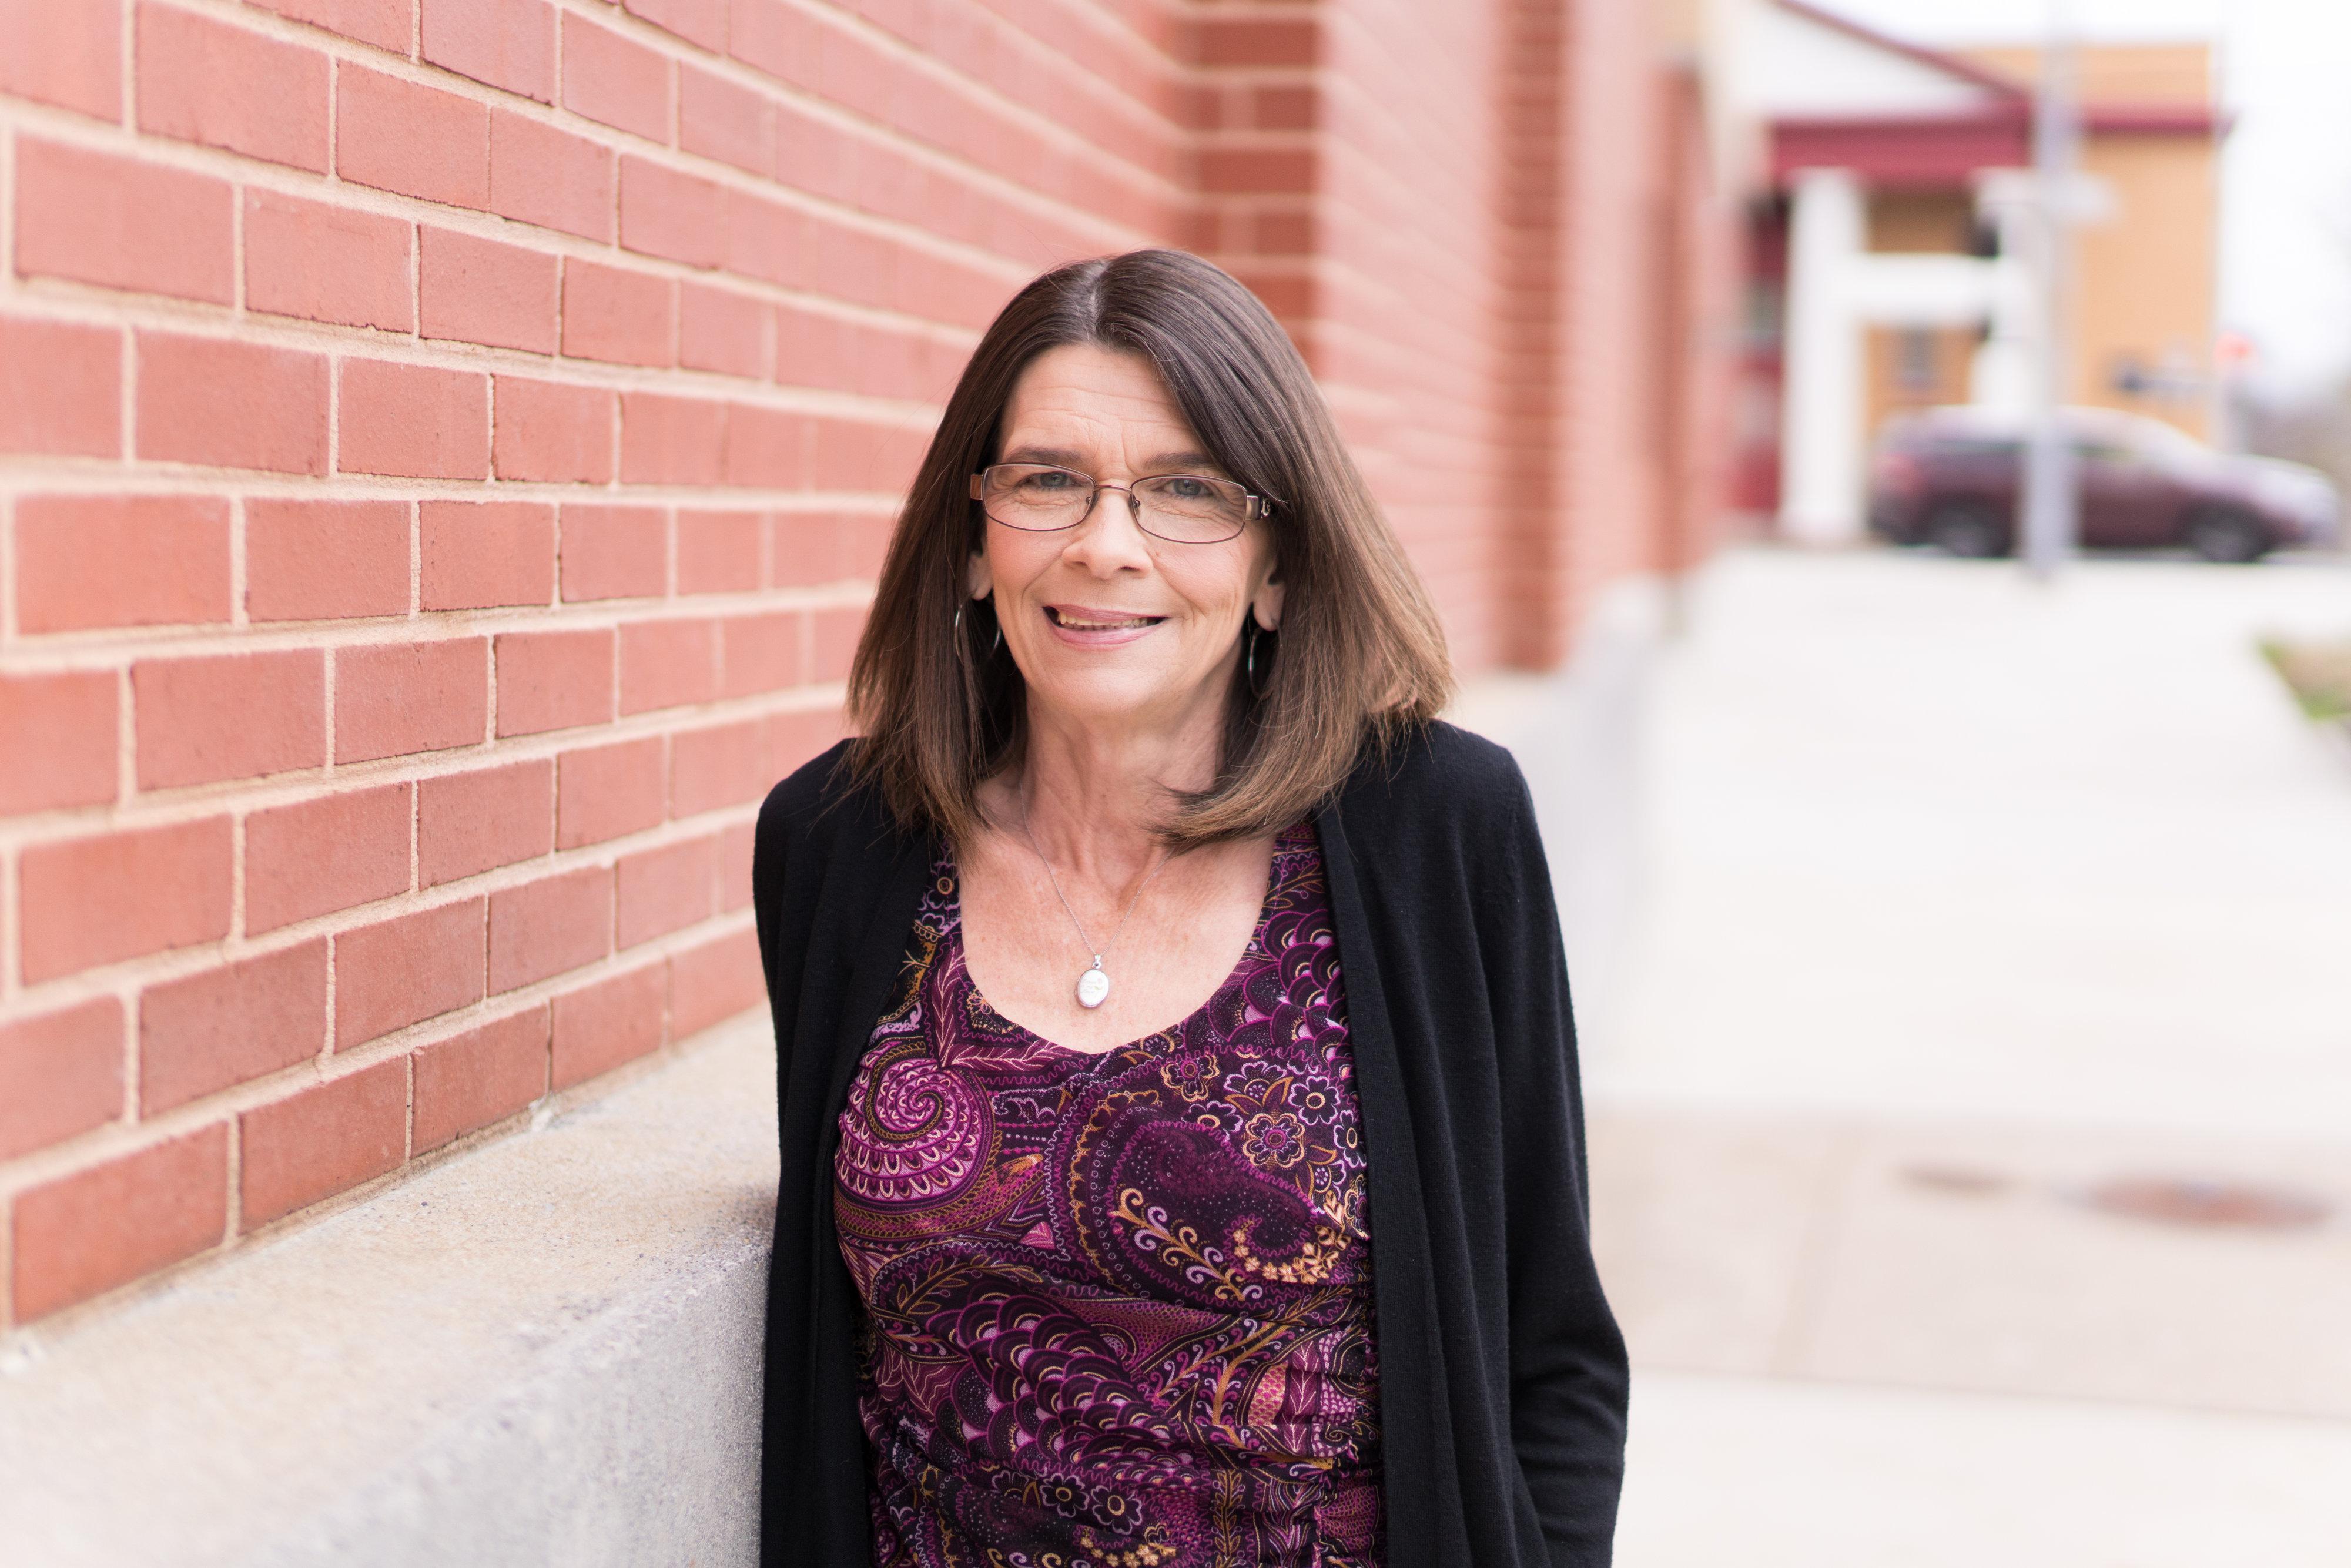 Pam Meador